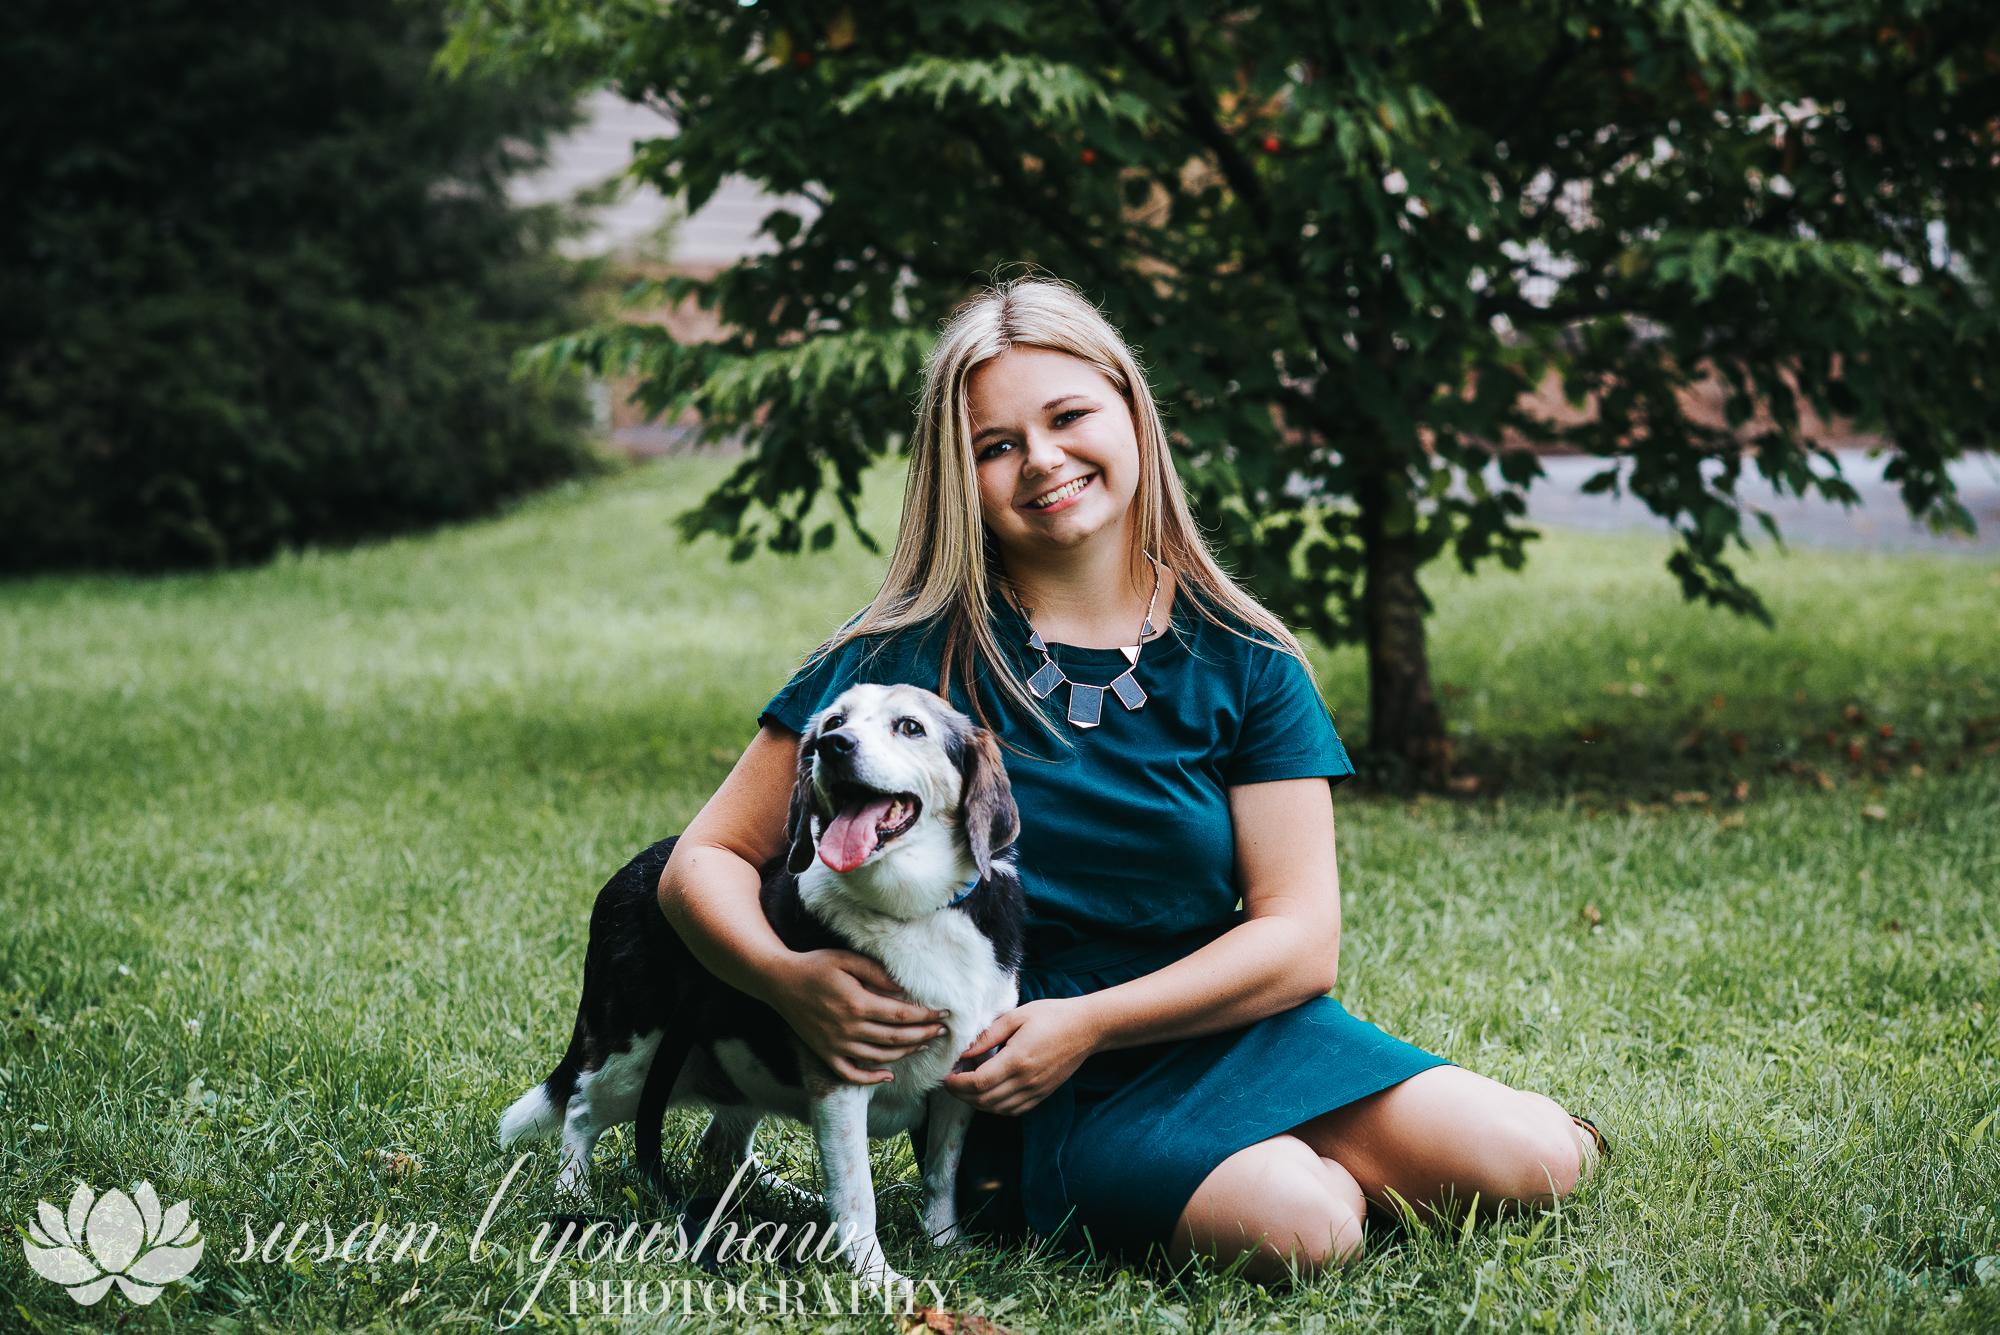 BLOG Karrie Bower 08-16-2018 SLY Photography LLC-5.jpg